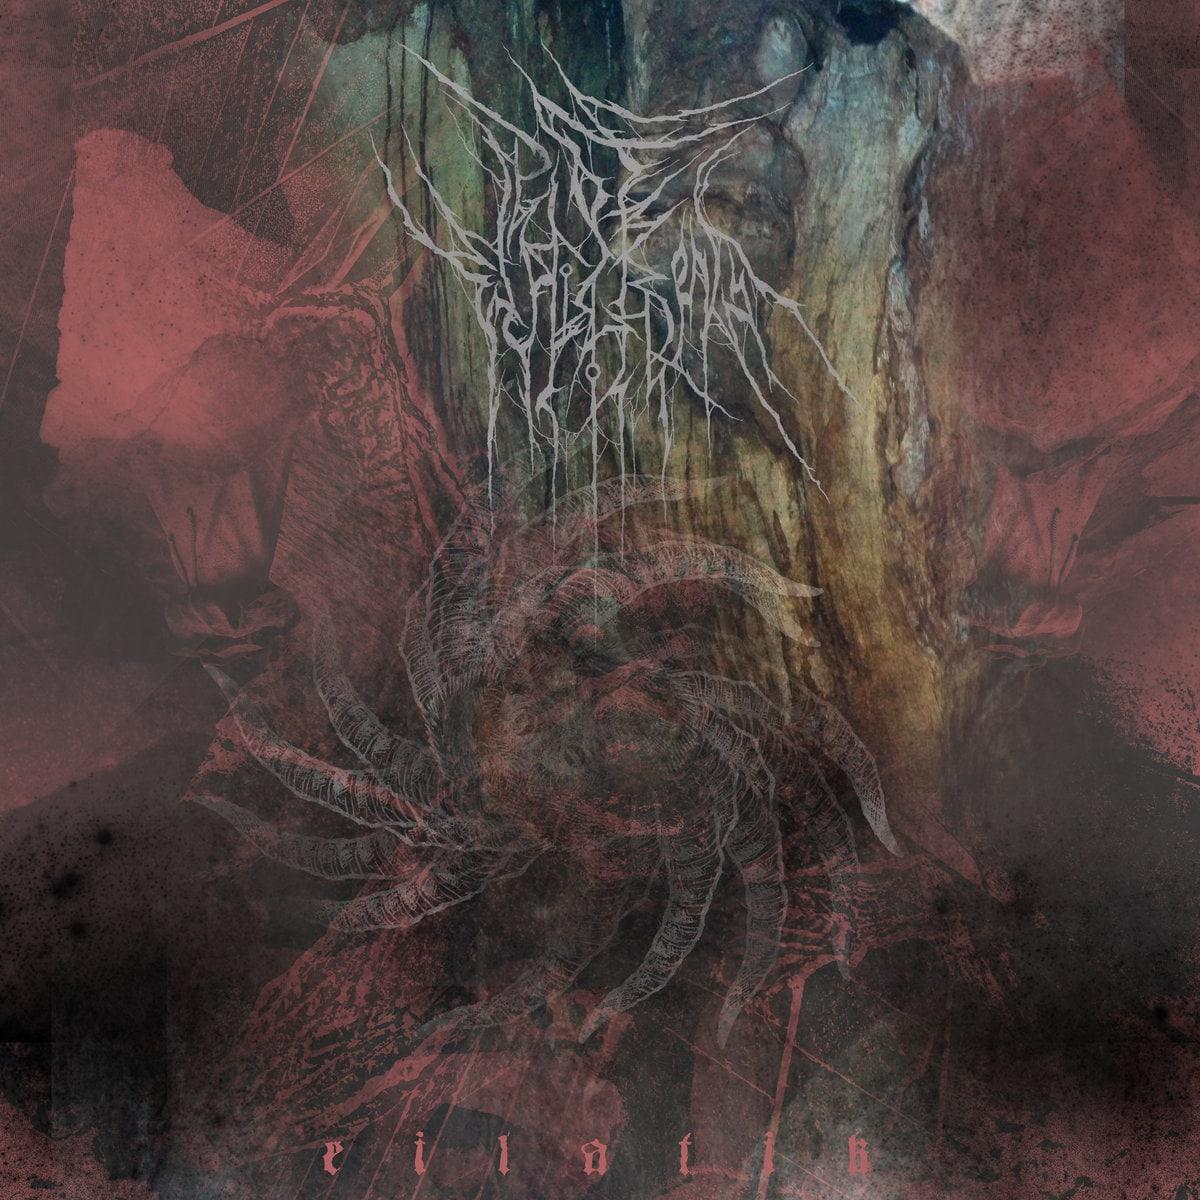 Pestilength - Eilatik